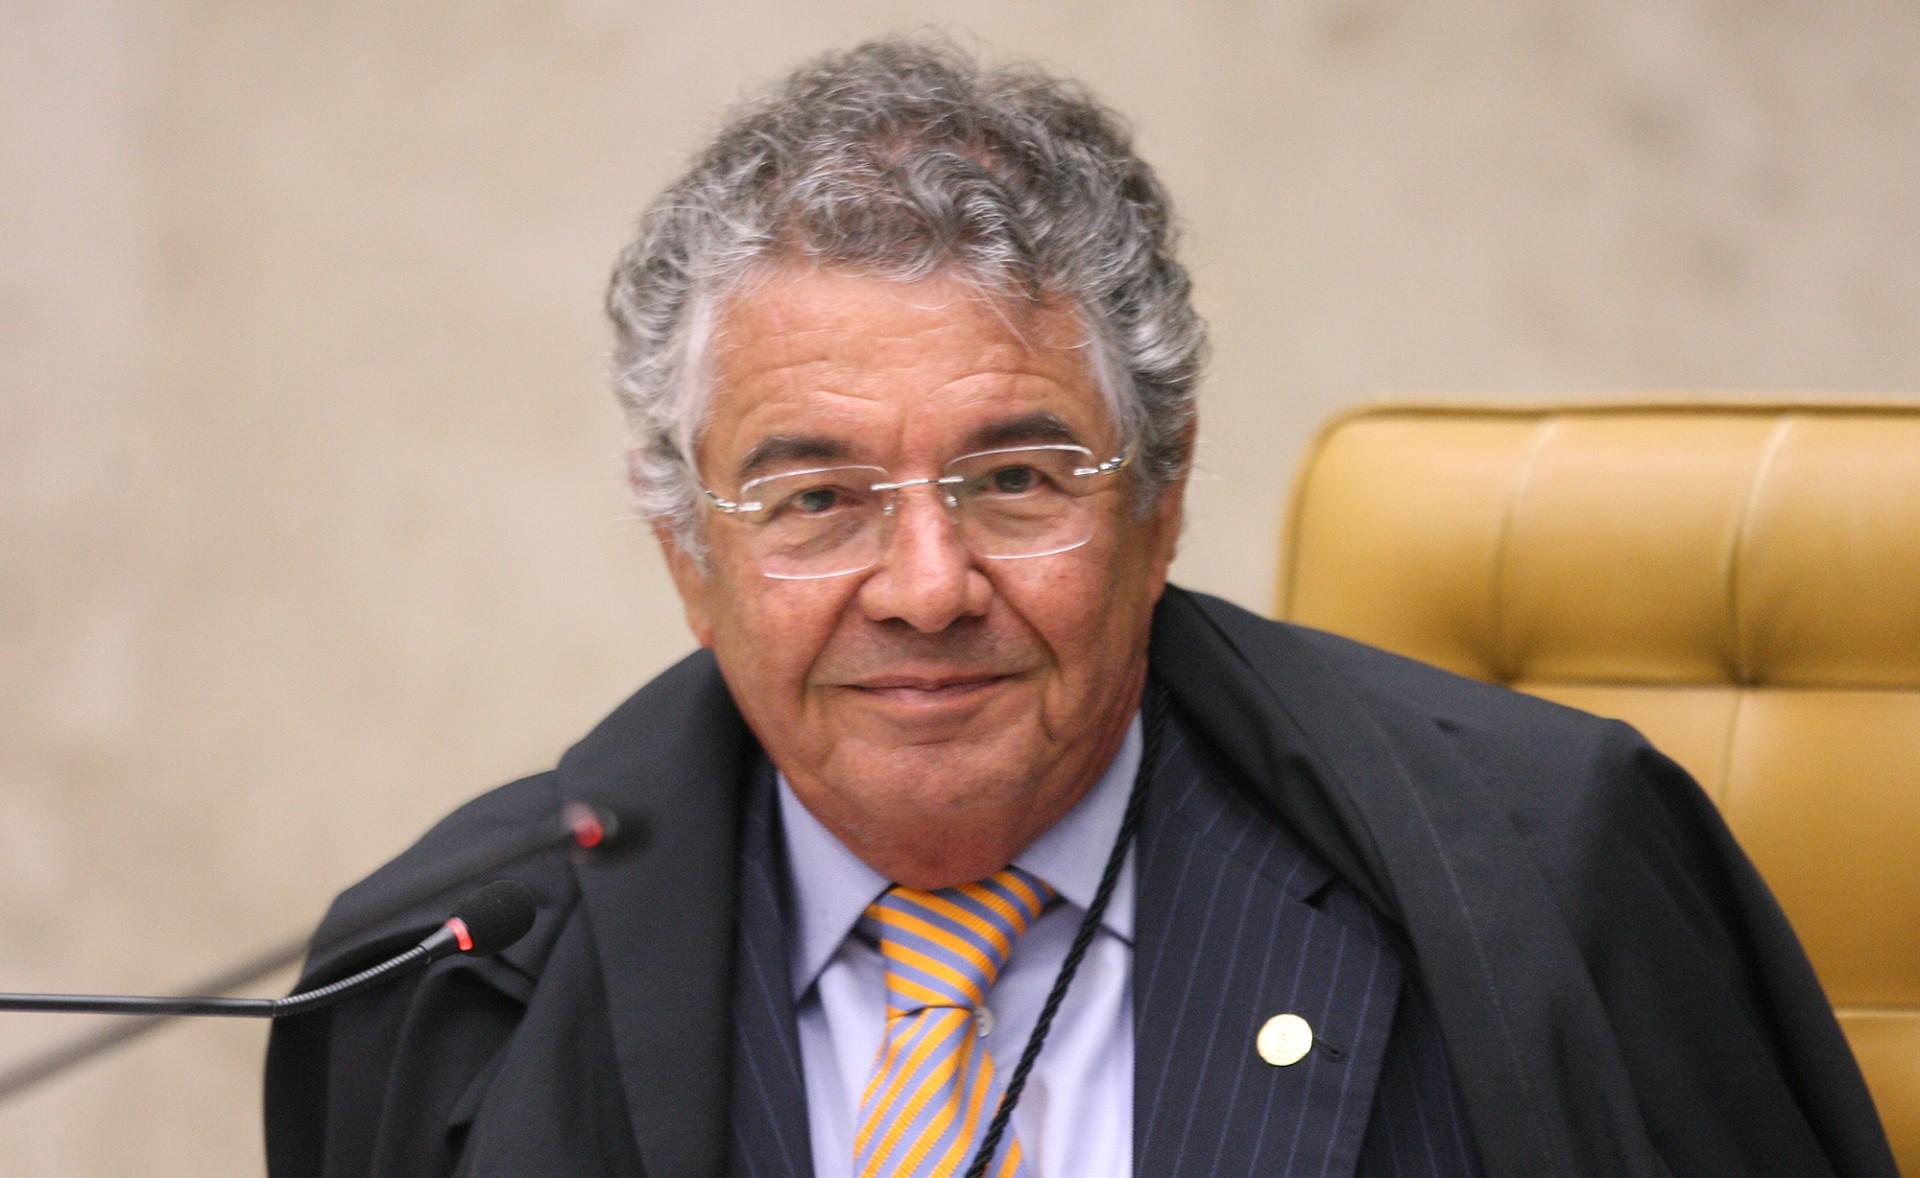 MINISTRO Marco Aurélio Mello está no STF desde 1990